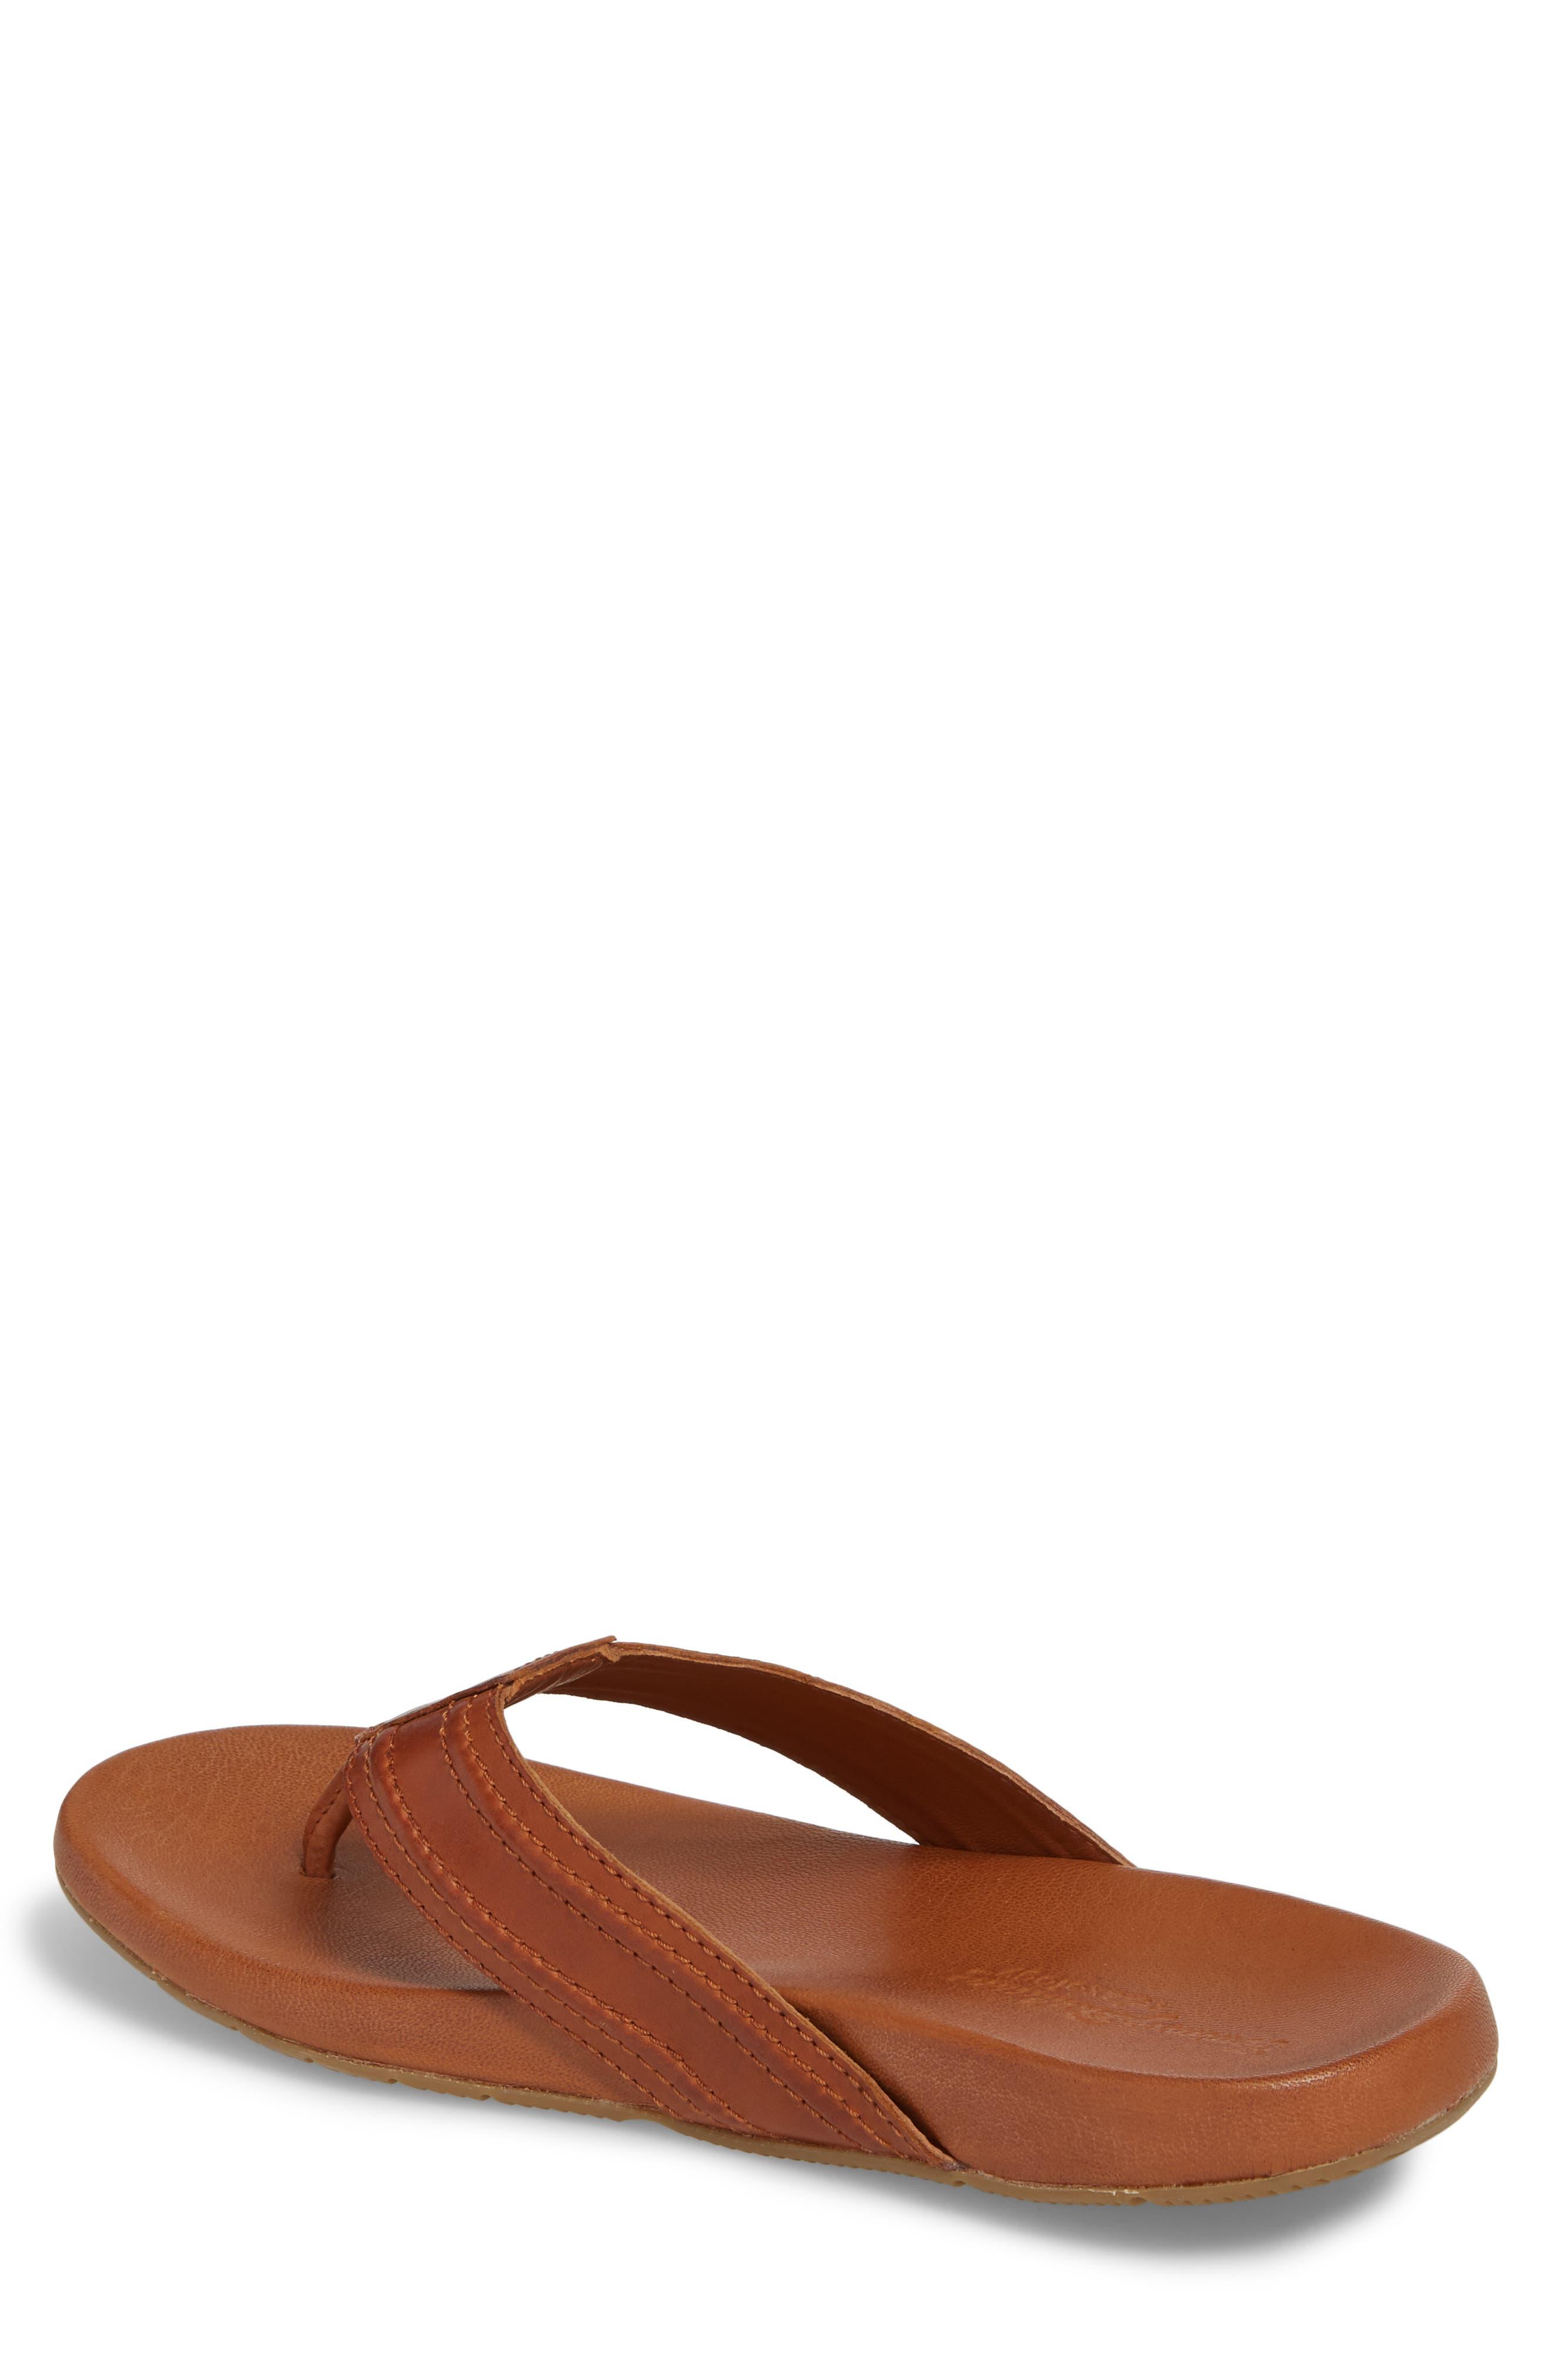 Mayaguana Flip Flop,                             Alternate thumbnail 2, color,                             Tan Leather